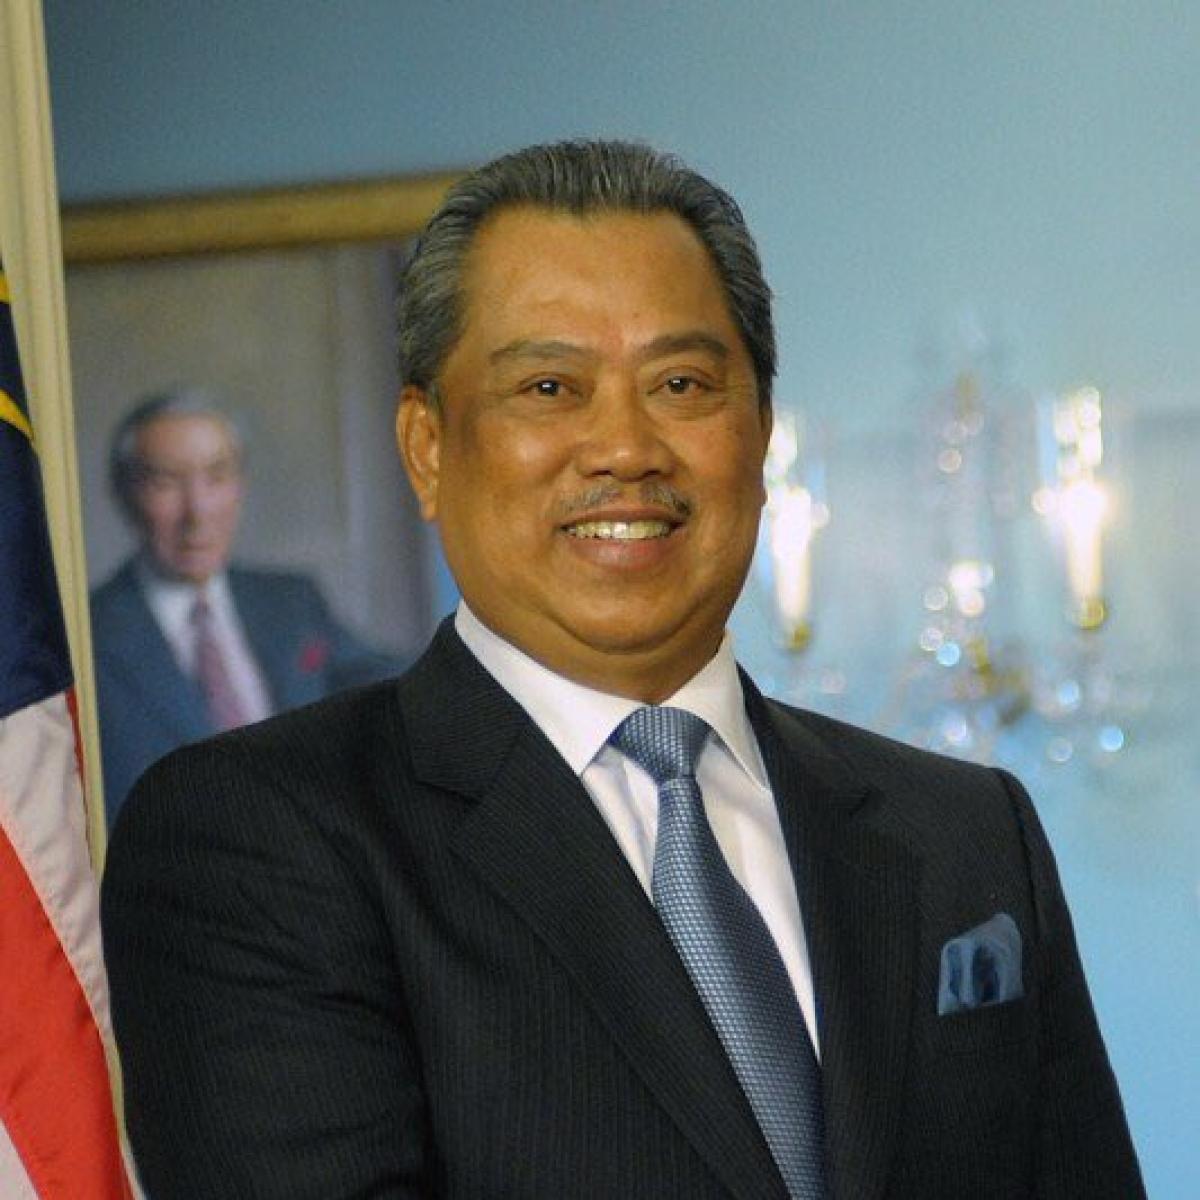 Muhyiddin Yassin is new Malaysian PM